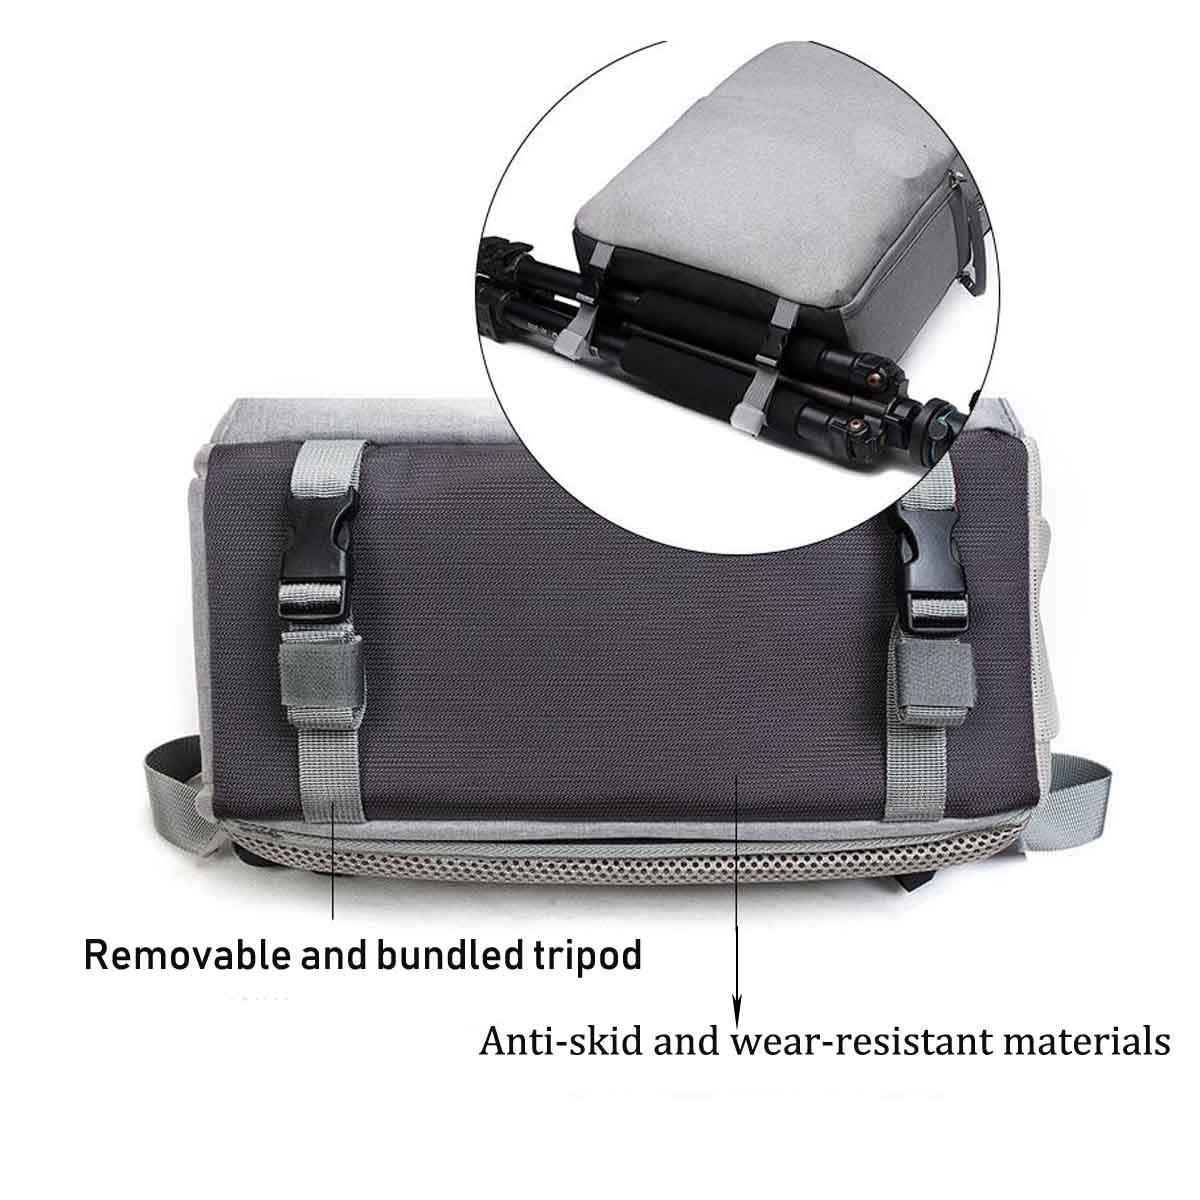 Tubackpack Camera Bag DSLR Laptop Backpack Waterproof Travel Large Size Water Resistant Lens Tripod and Accessories for Men Women L5-L, Light-Grey